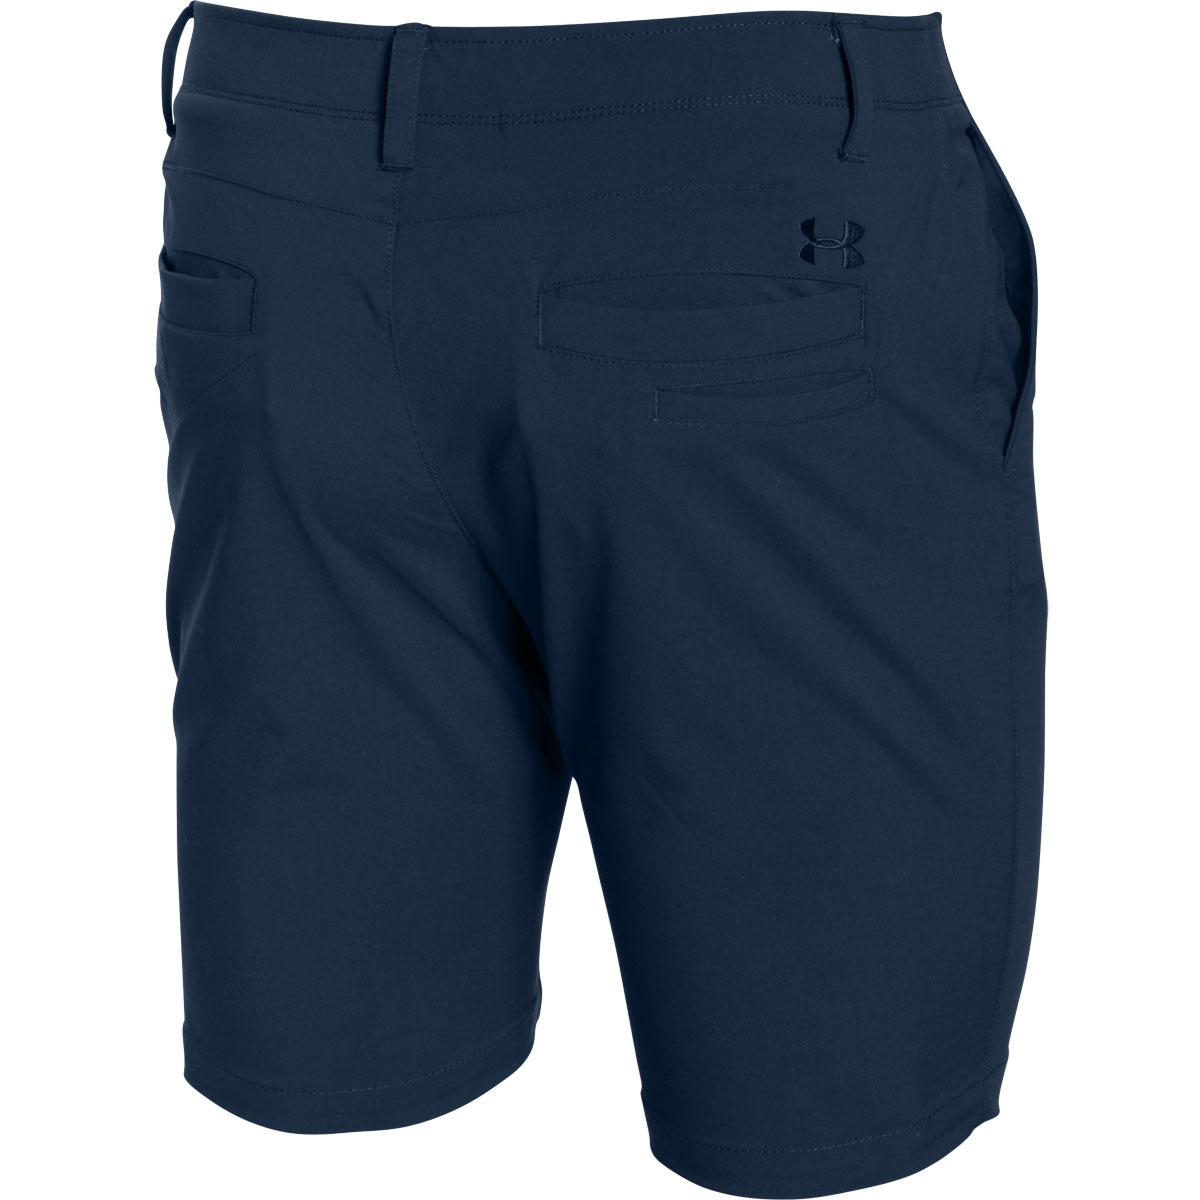 Under-Armour-Homme-UA-Match-Play-conique-Tech-Performance-Golf-Shorts-29-off-RRP miniature 3